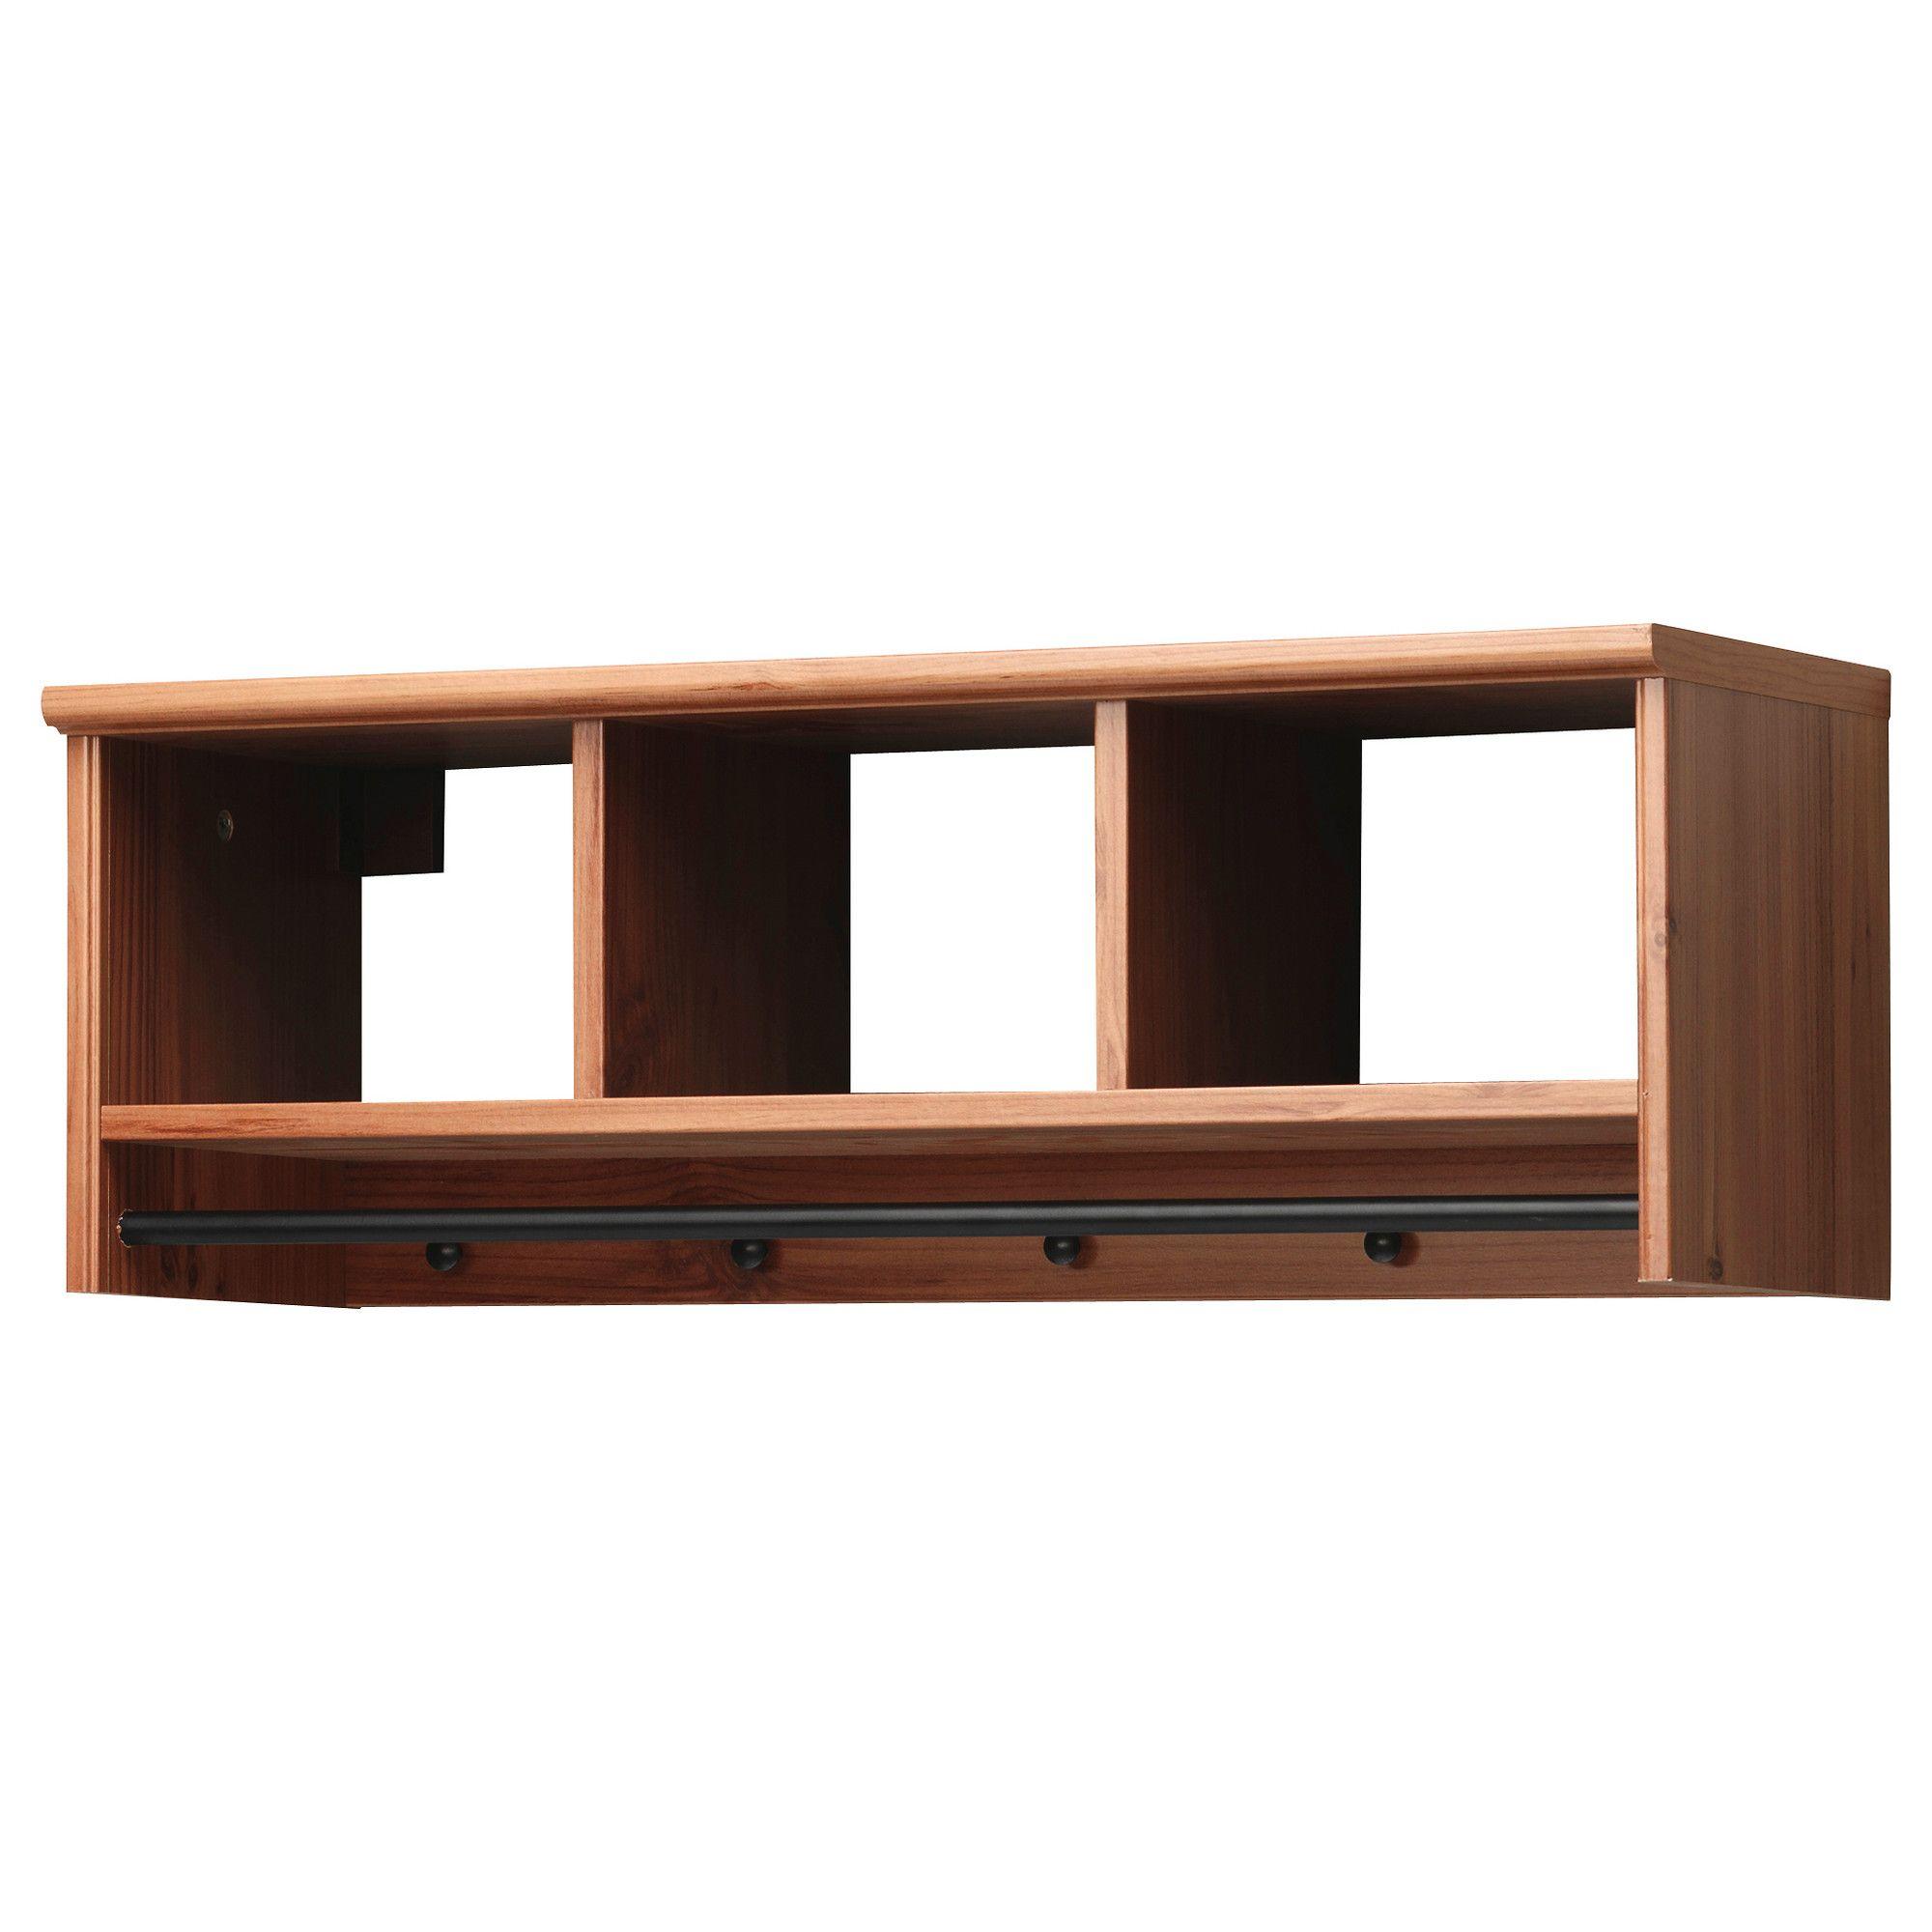 grevb ck tag re pat re ikea sport bar pinterest tag re ikea et patere ikea. Black Bedroom Furniture Sets. Home Design Ideas